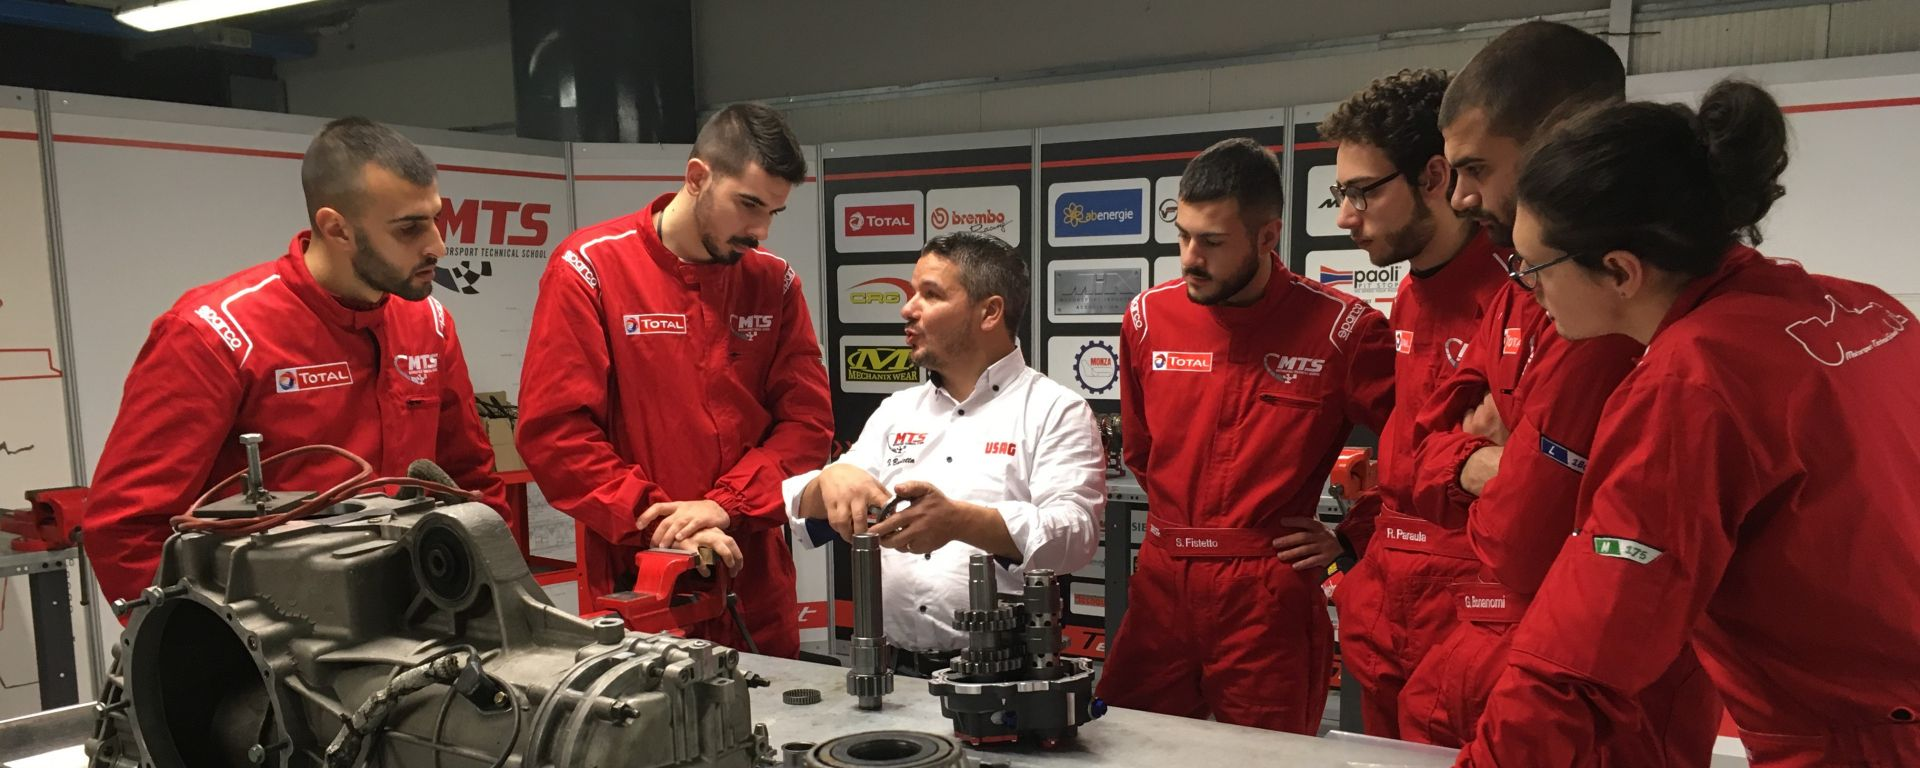 Motorsport Technical School: i ragazzi in aula